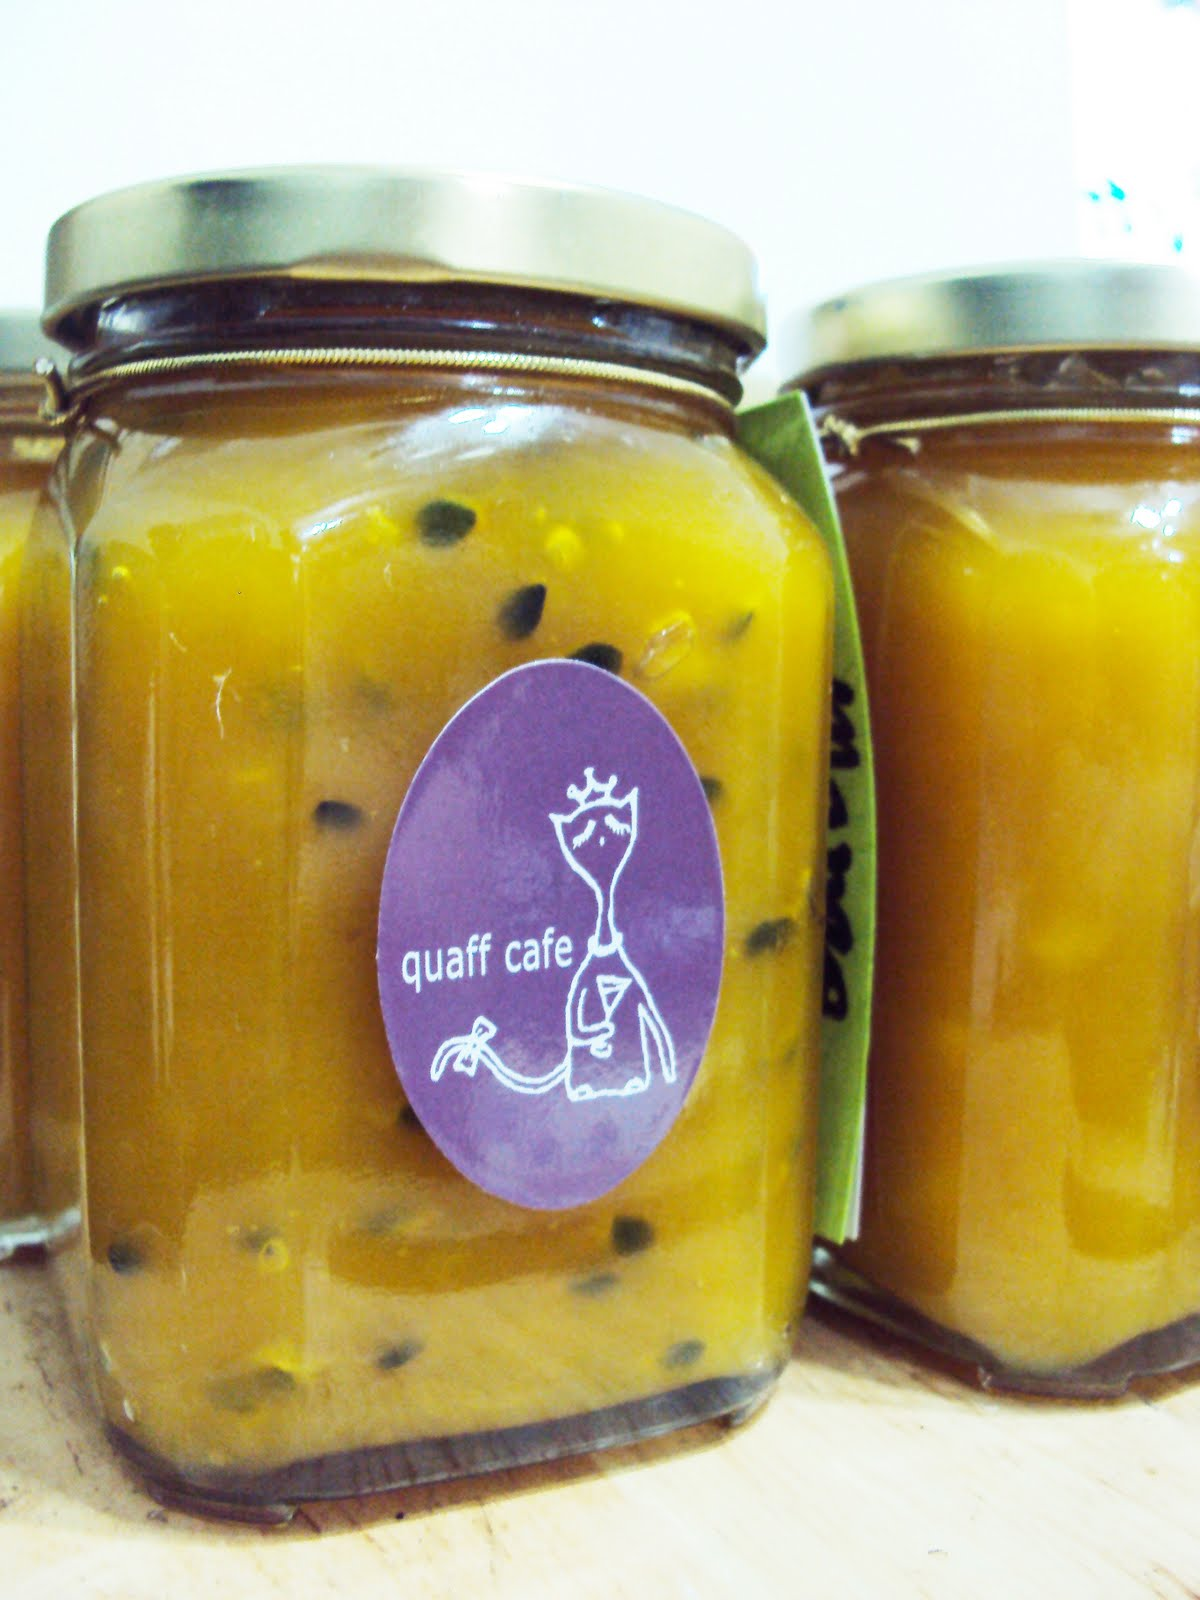 quaff cafe 樂融融餐室: 芒果 & 芒果百香果醬